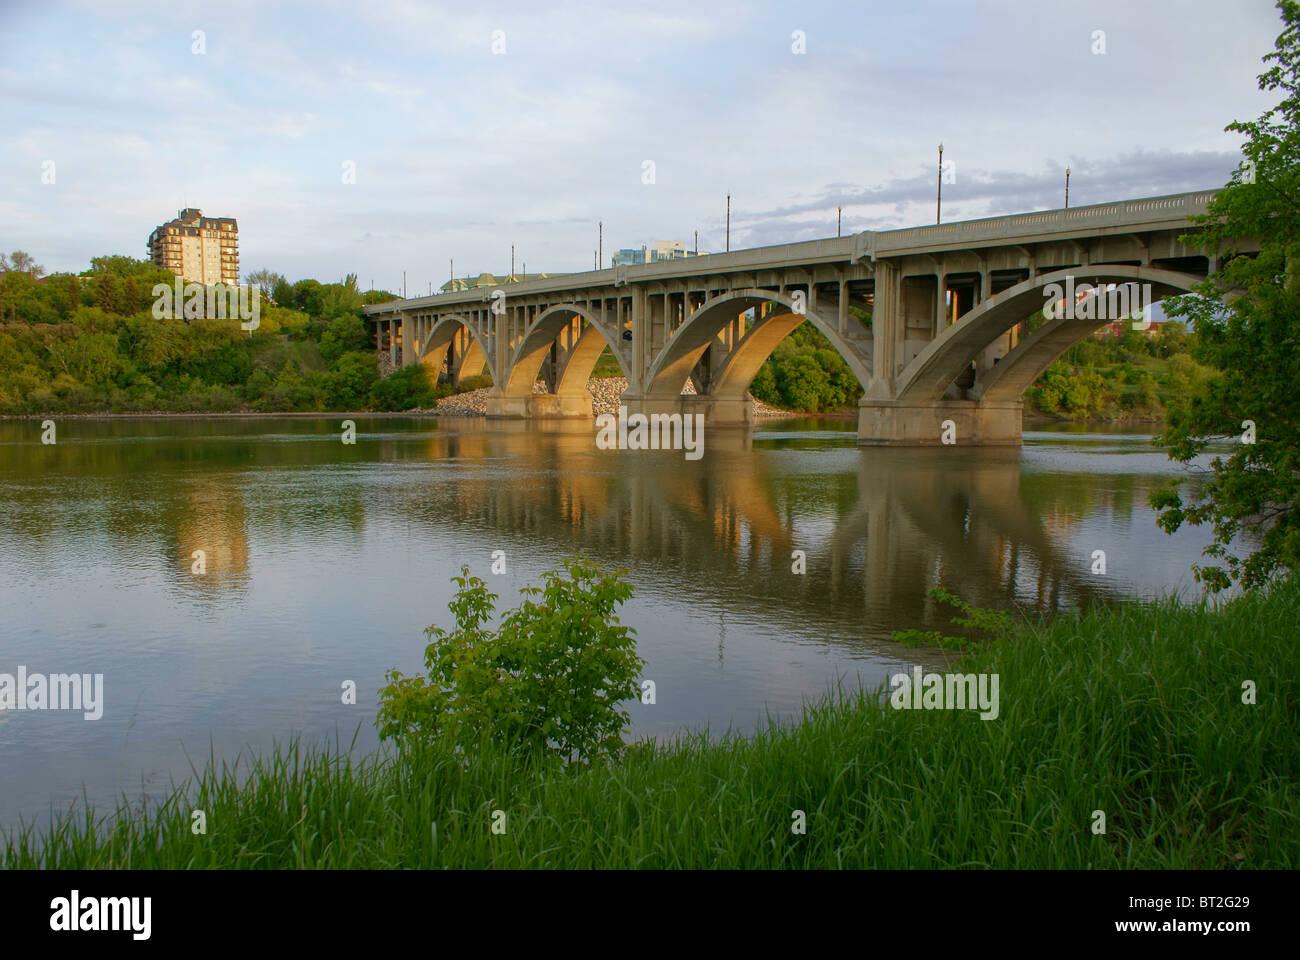 1932 Broadway Bridge landmark in Saskatoon, Saskatchewan, vehicle concrete arch Dean's Bridge spanning South - Stock Image